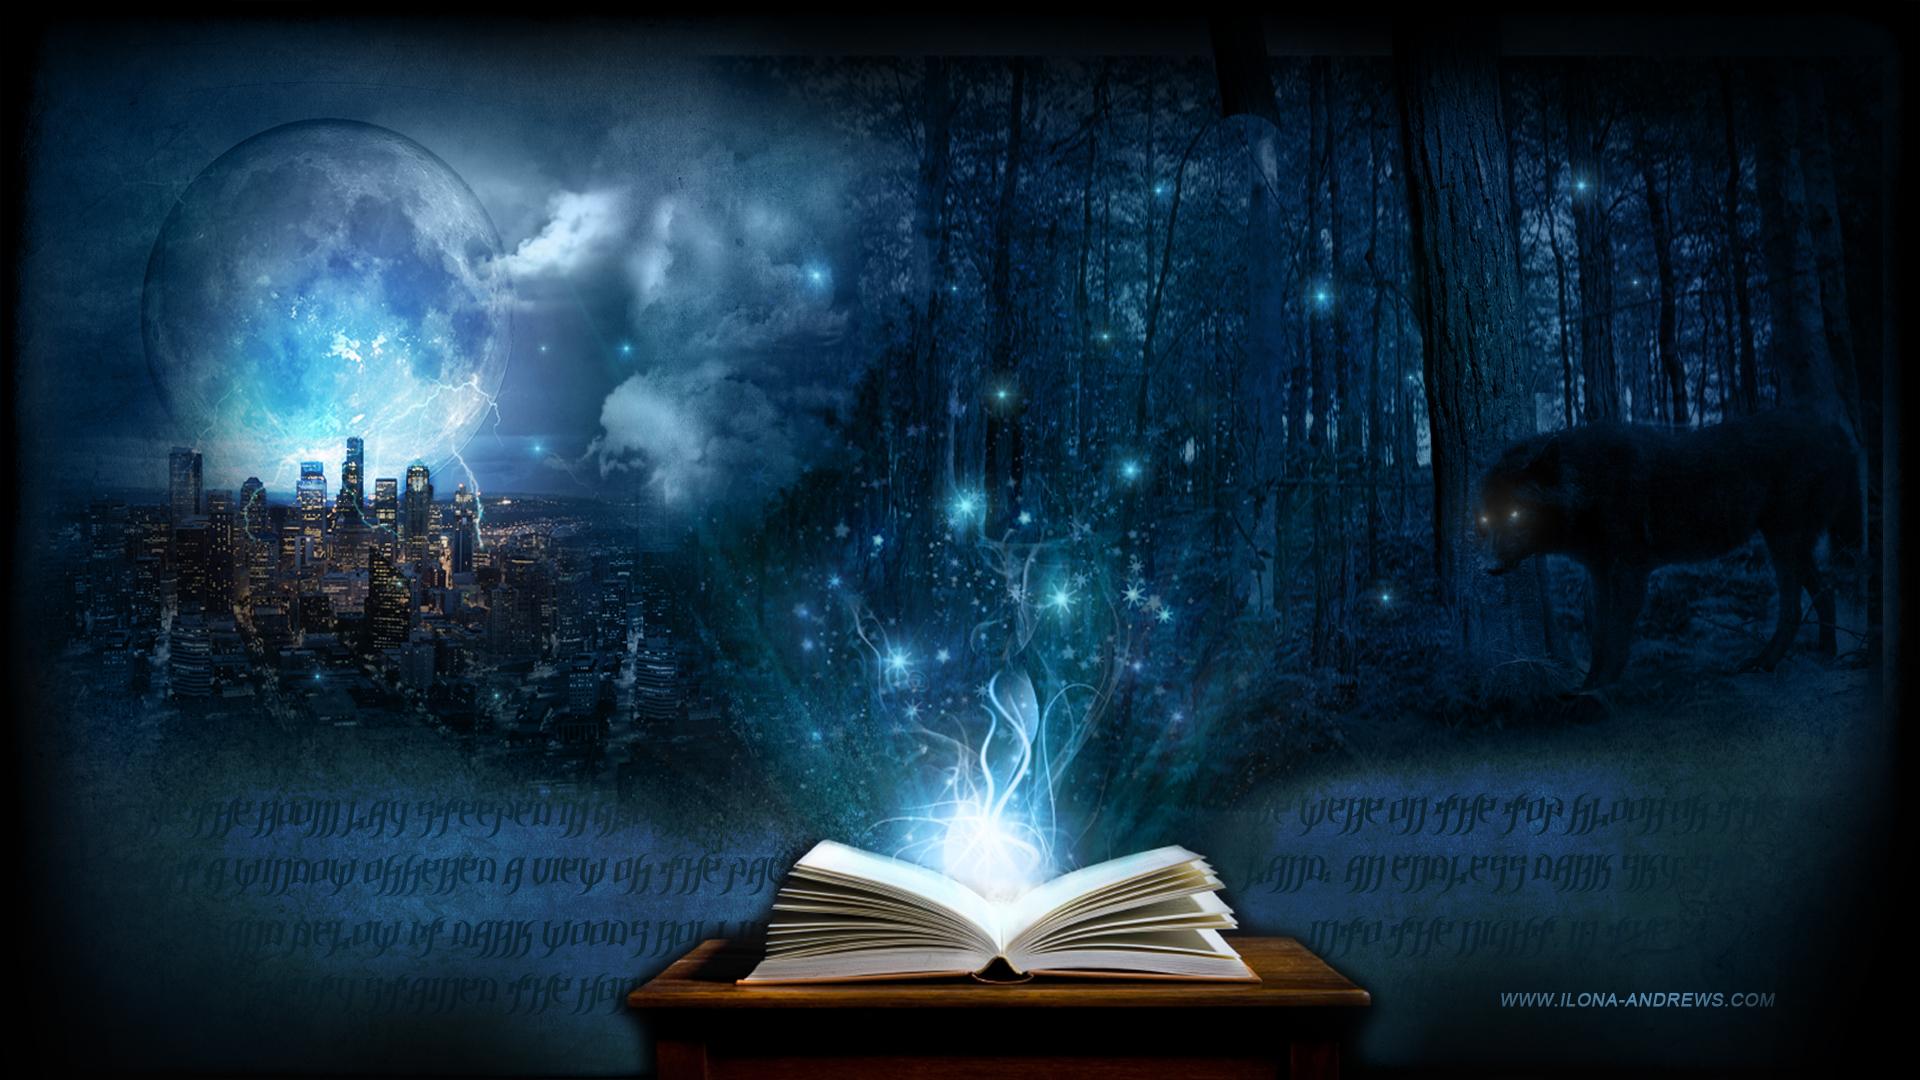 Download Magic Book Wallpaper 1920x1080 Full HD Wallpapers 1920x1080